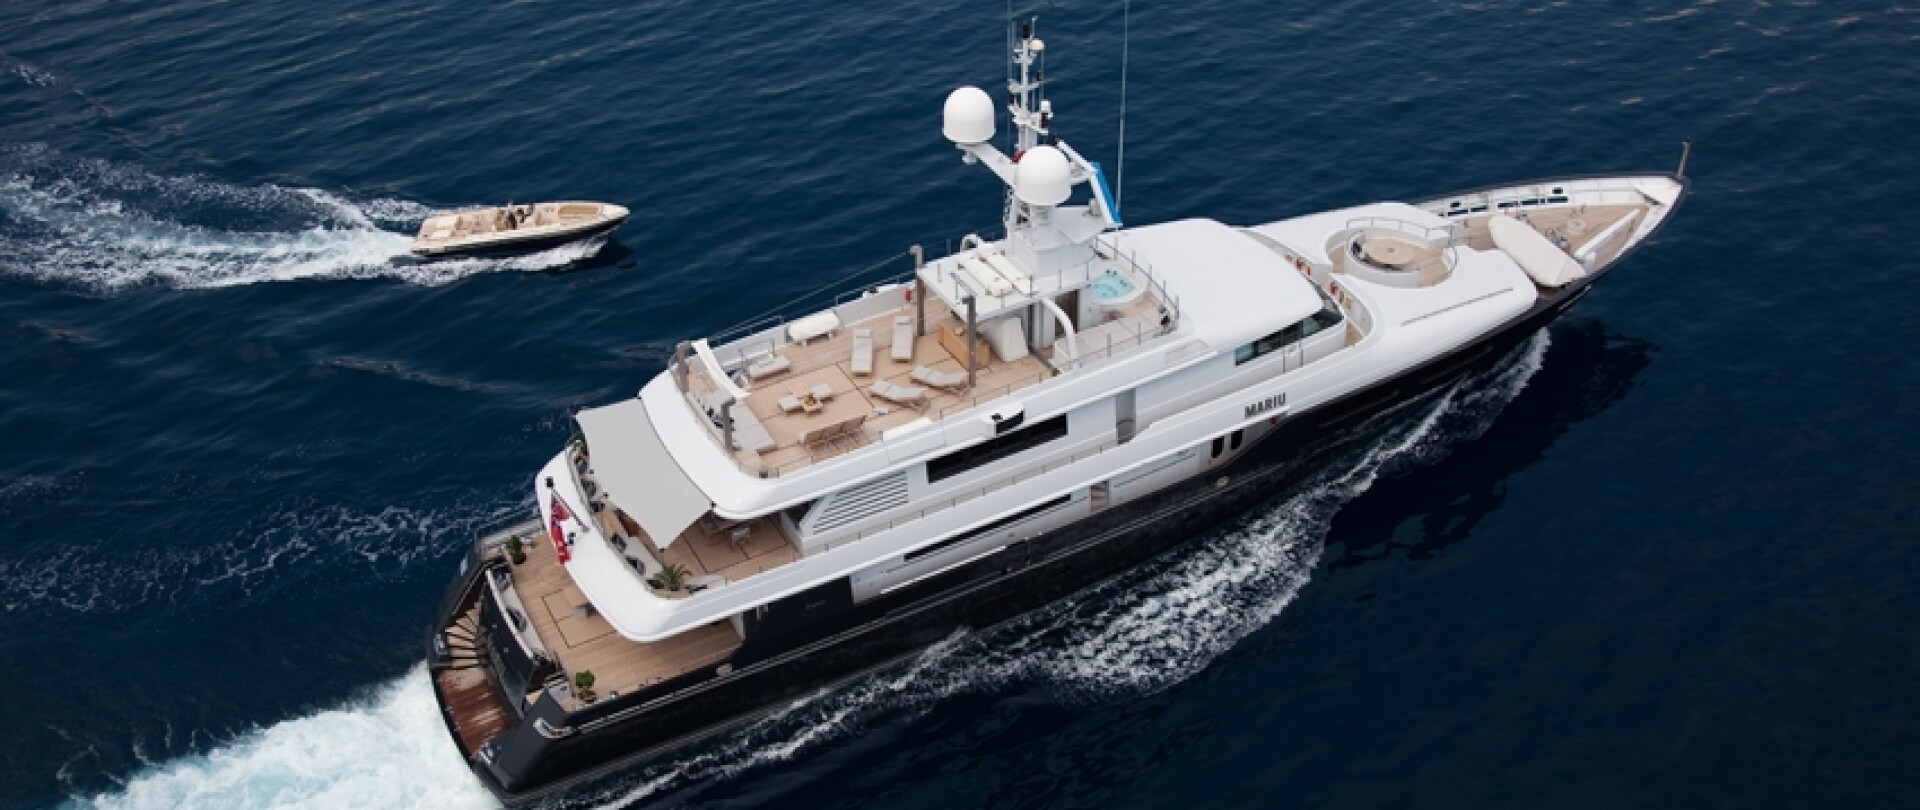 Edmiston Attending the 2014 Antigua Charter Yacht Show photo 1